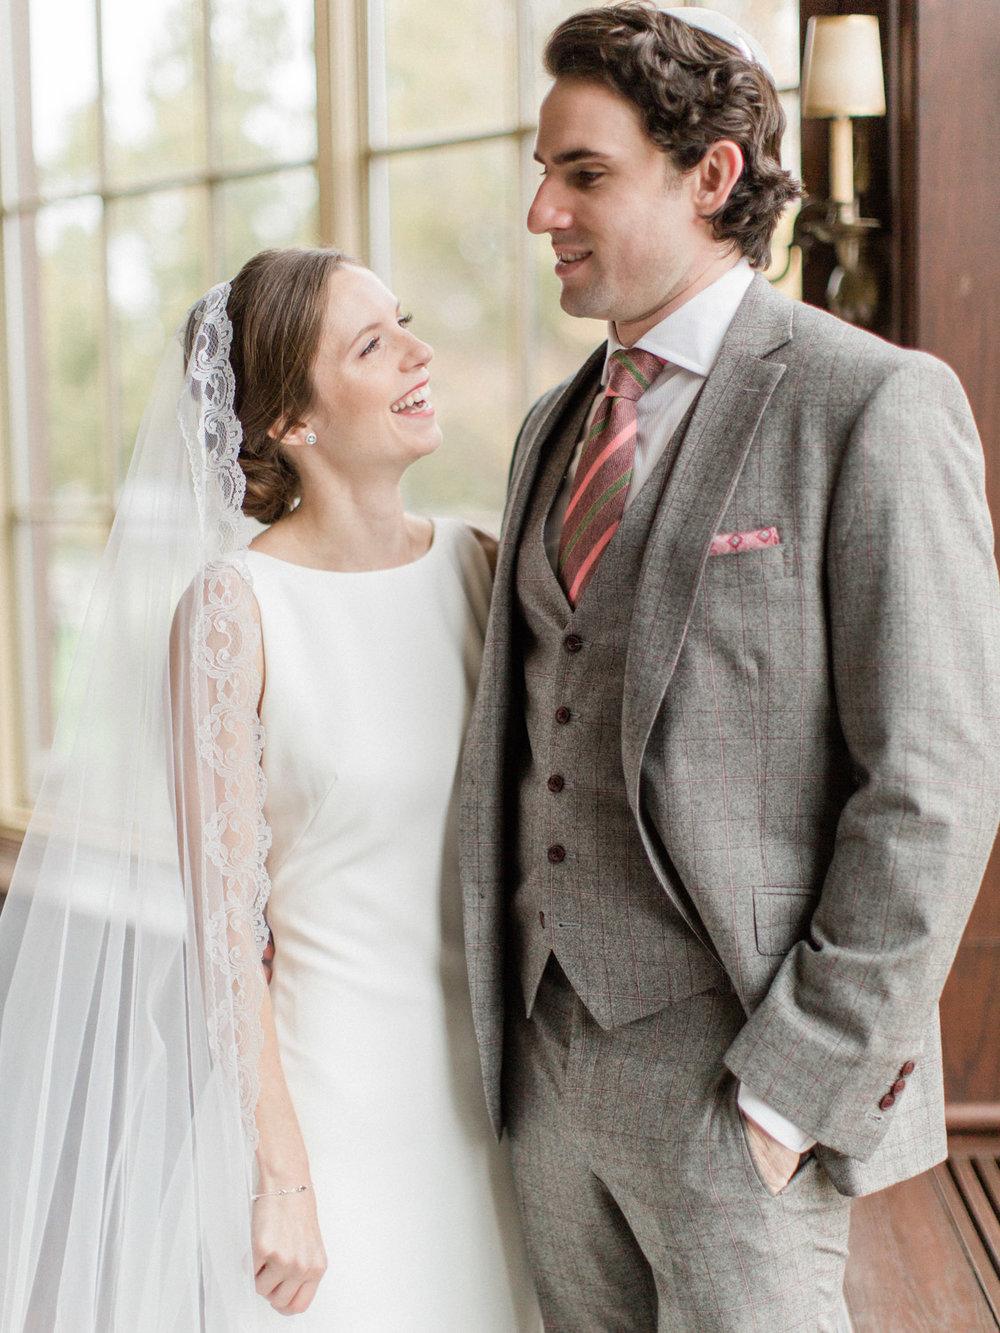 Toronto-wedding-photographer-st-georges-golf-club-jewish-modern-fall42.jpg